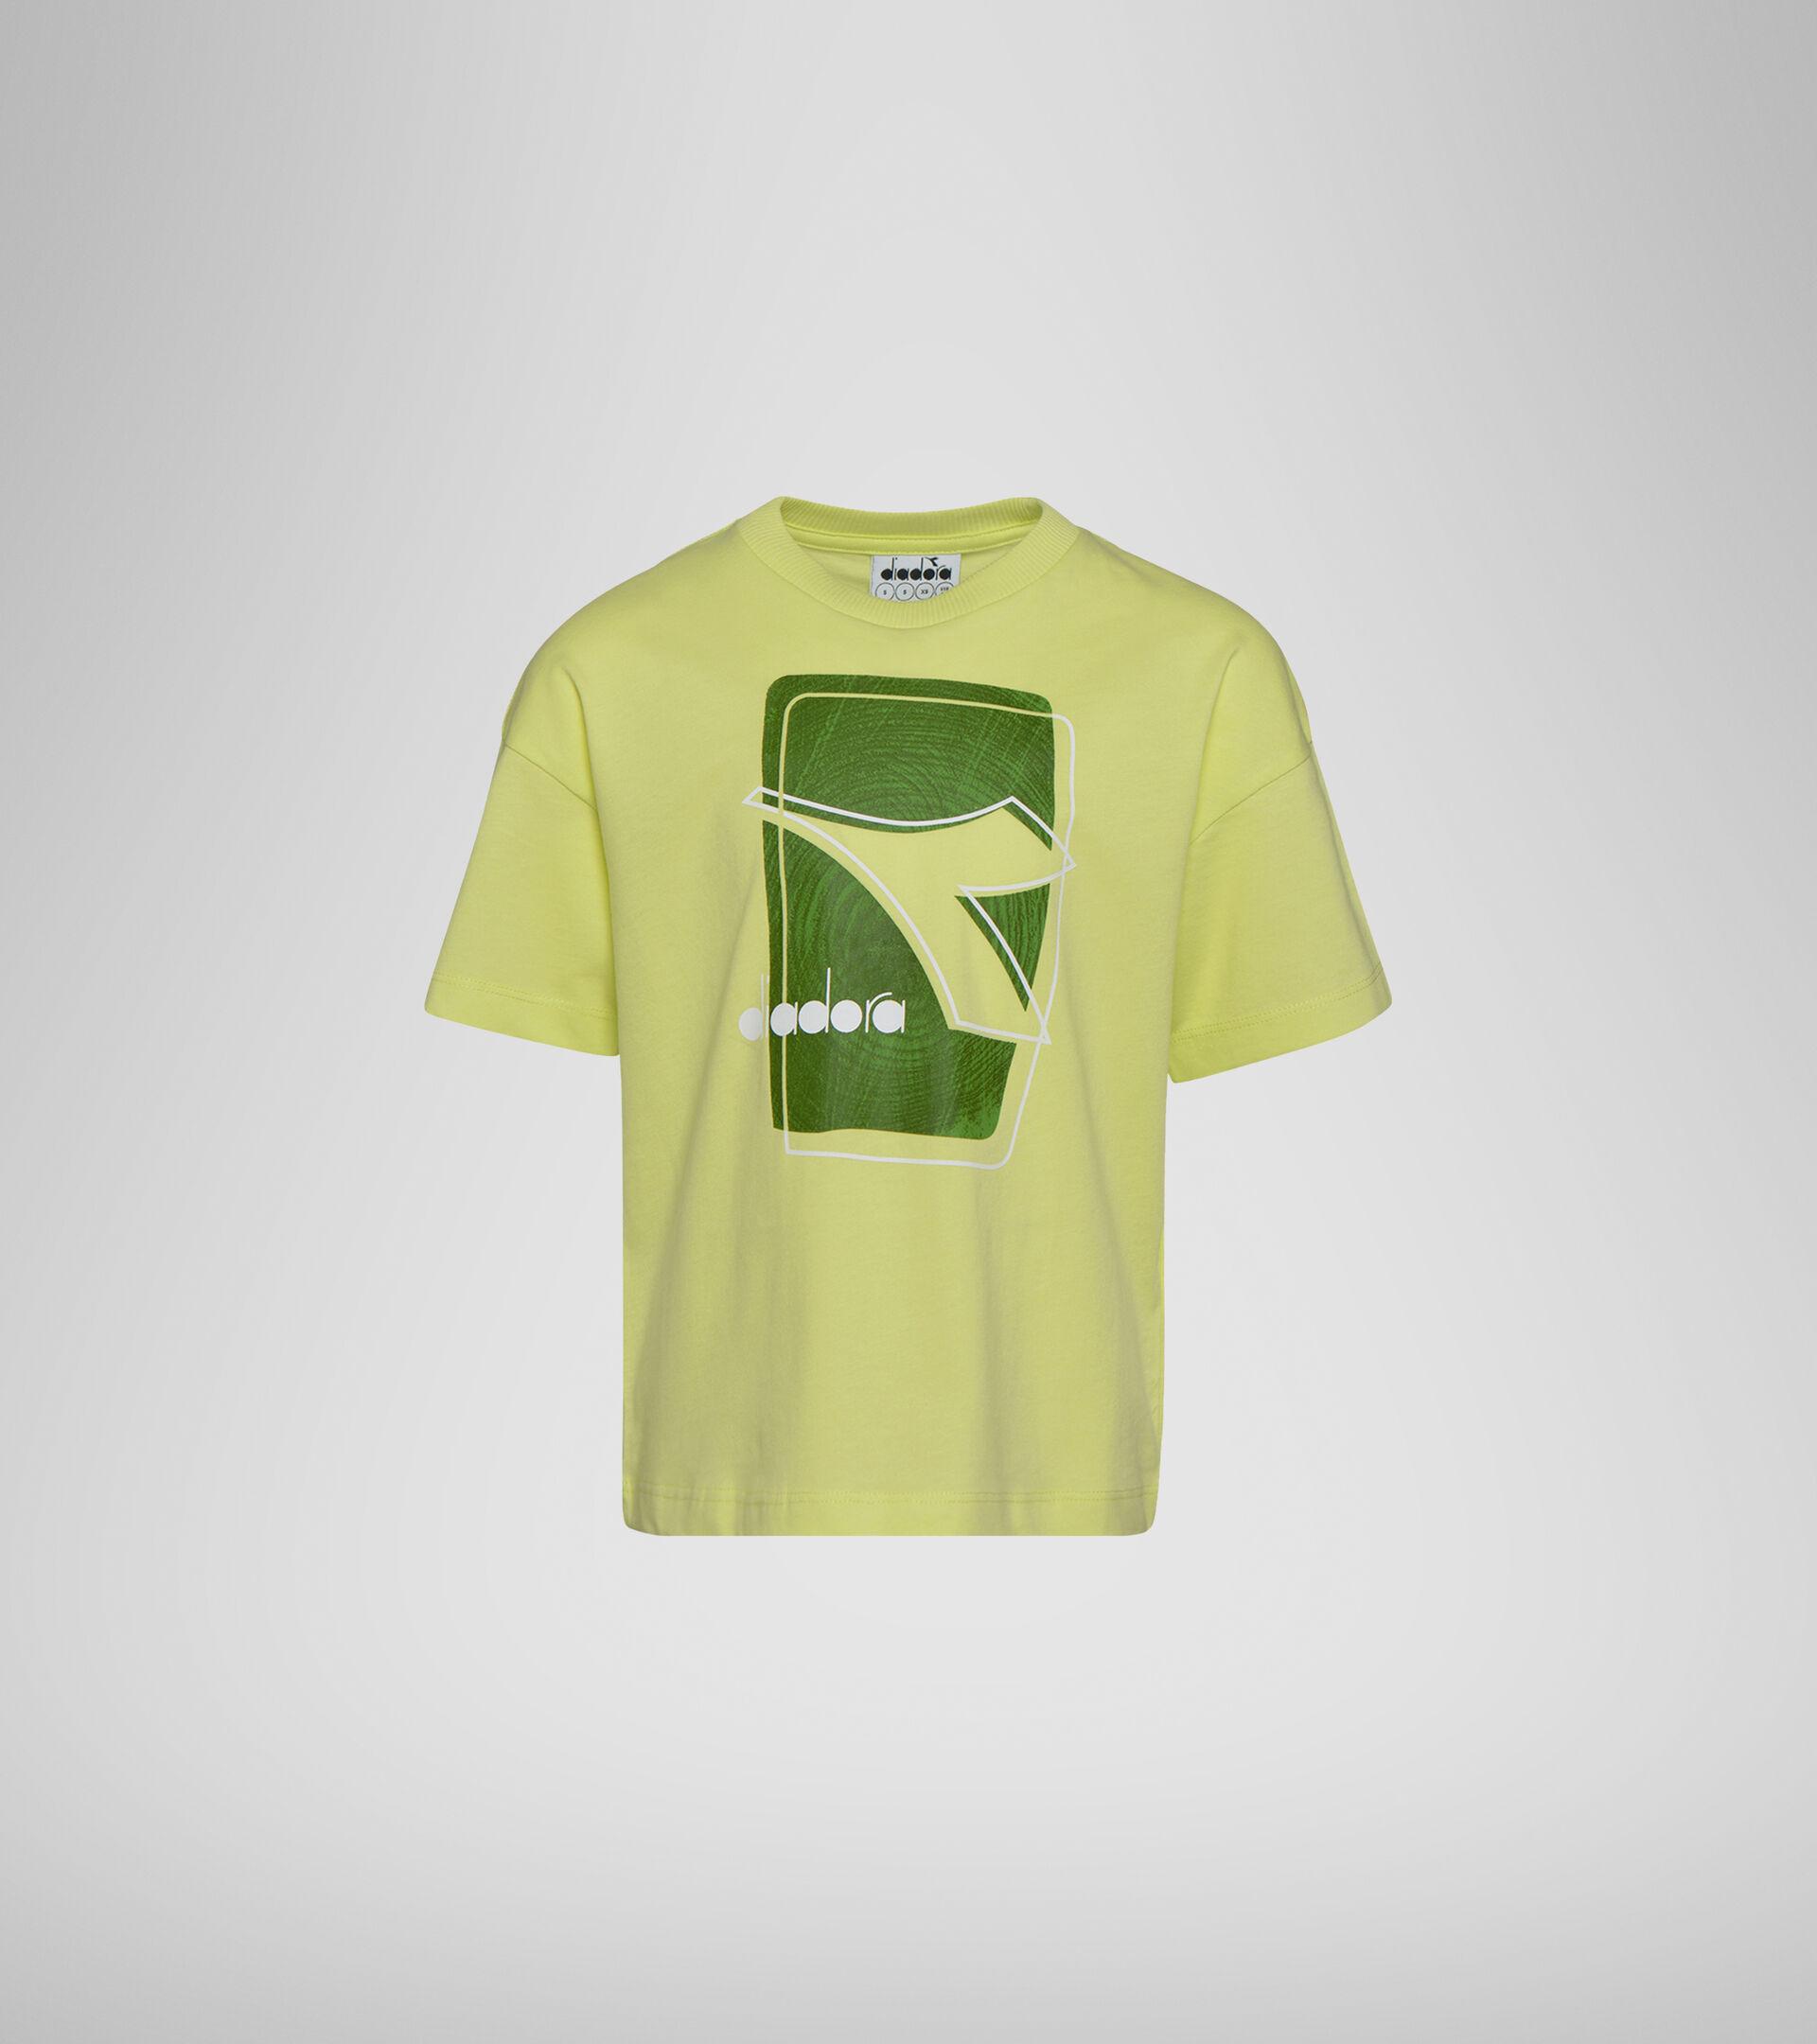 T-Shirt mit Logo -  Jungs und Mädchen JU. T-SHIRT SS ELEMENTS SONNIG LIMONE - Diadora